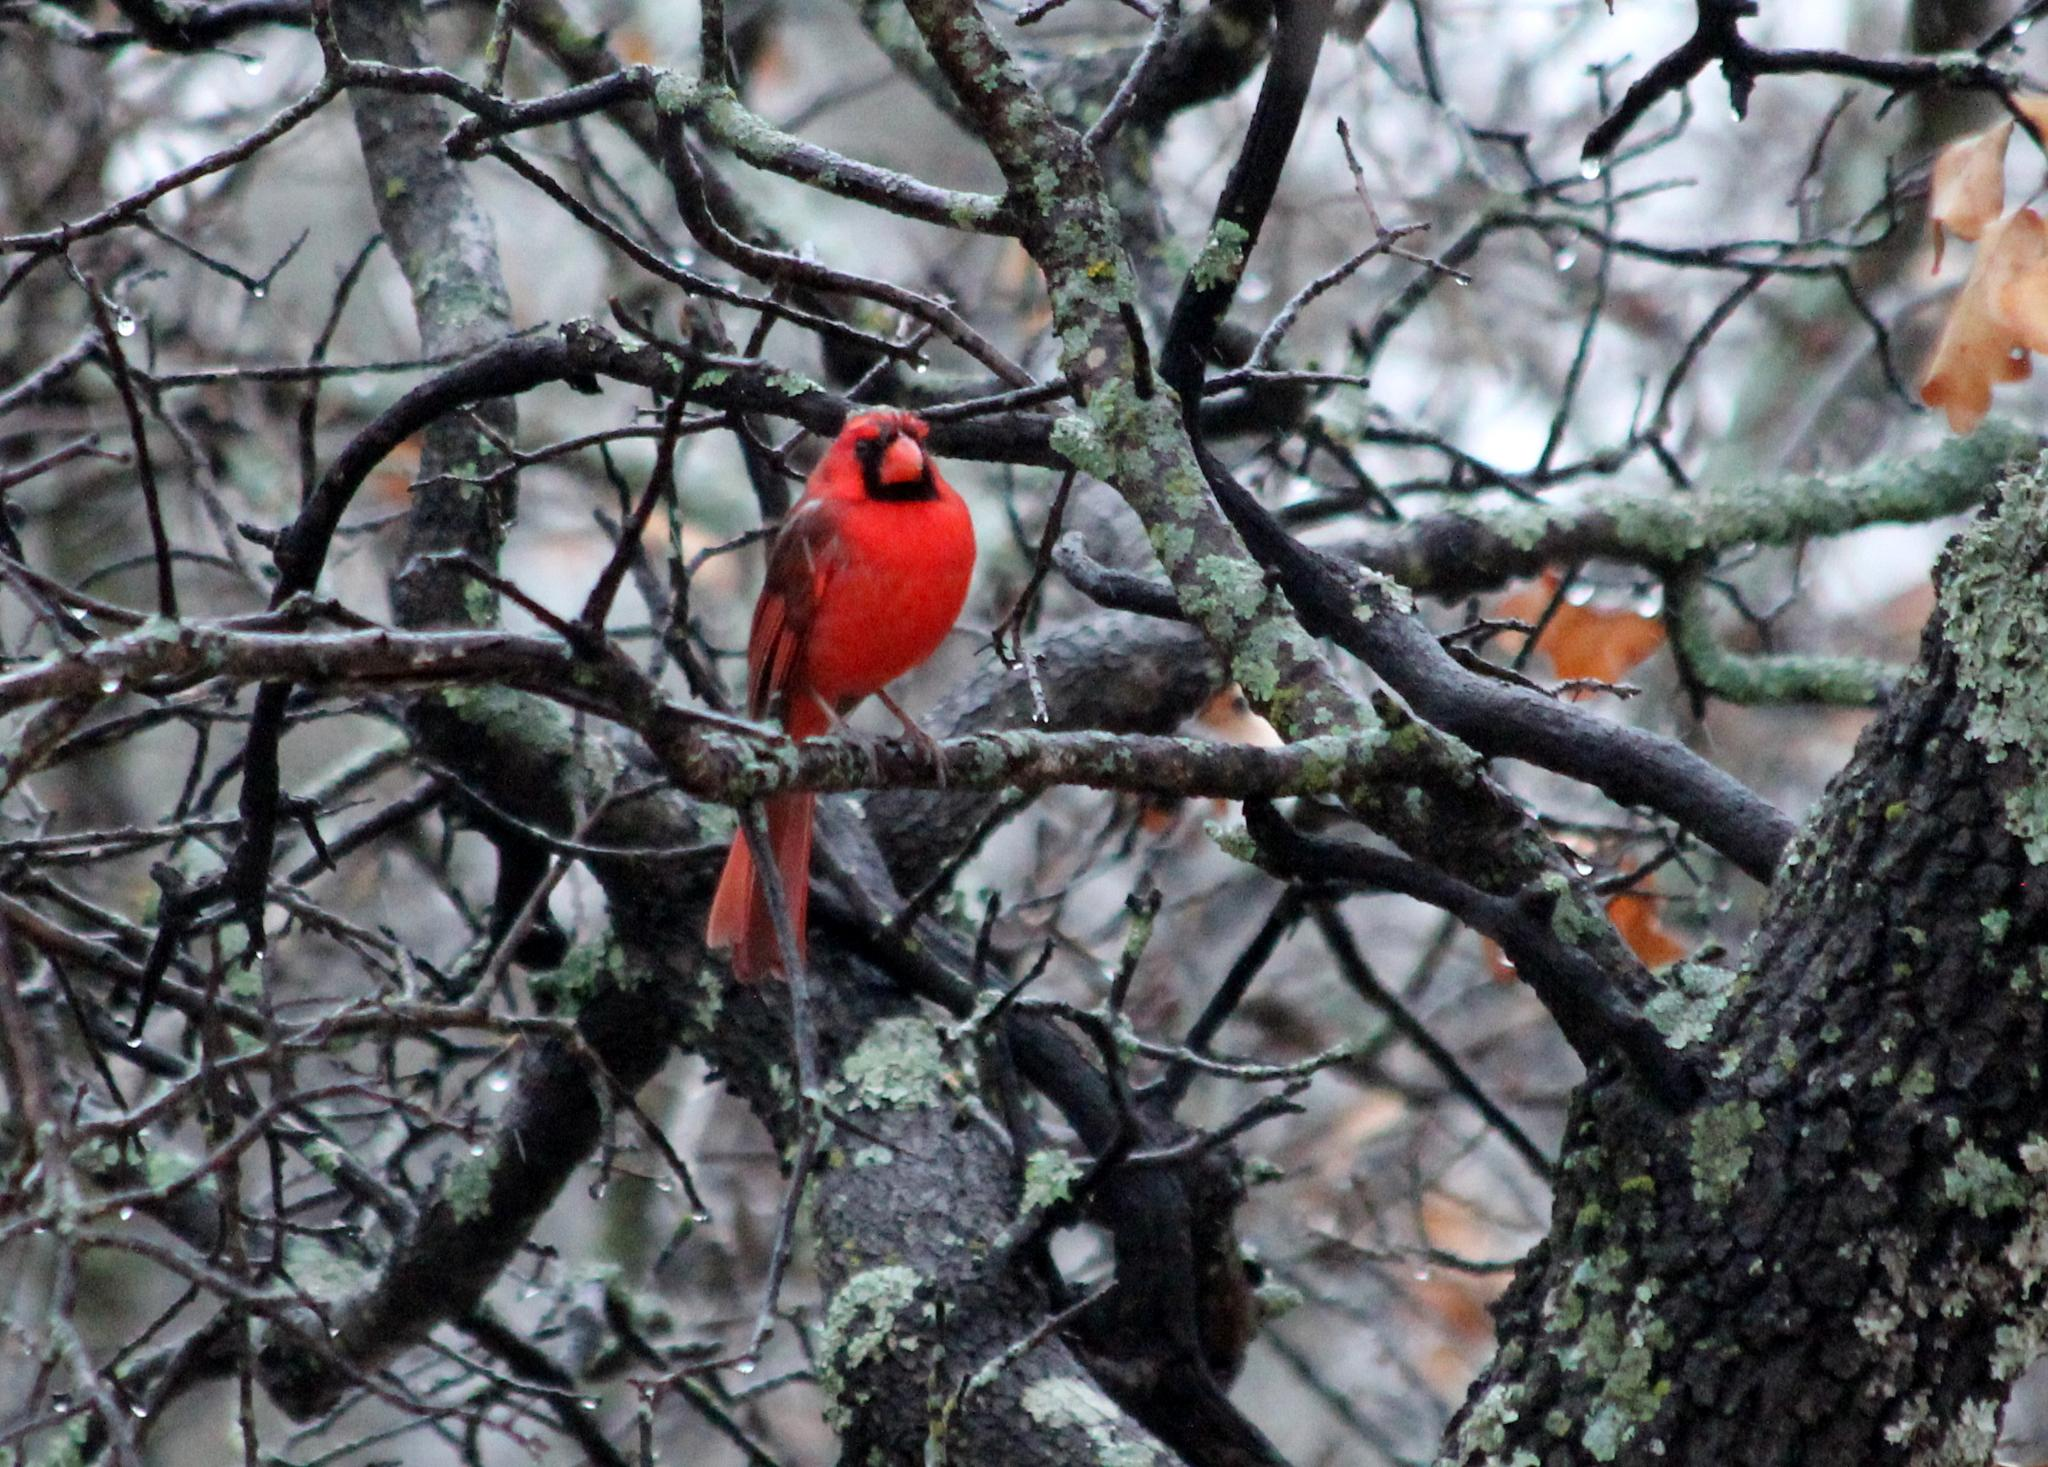 Cold Rainy Redbird by cat.beaty